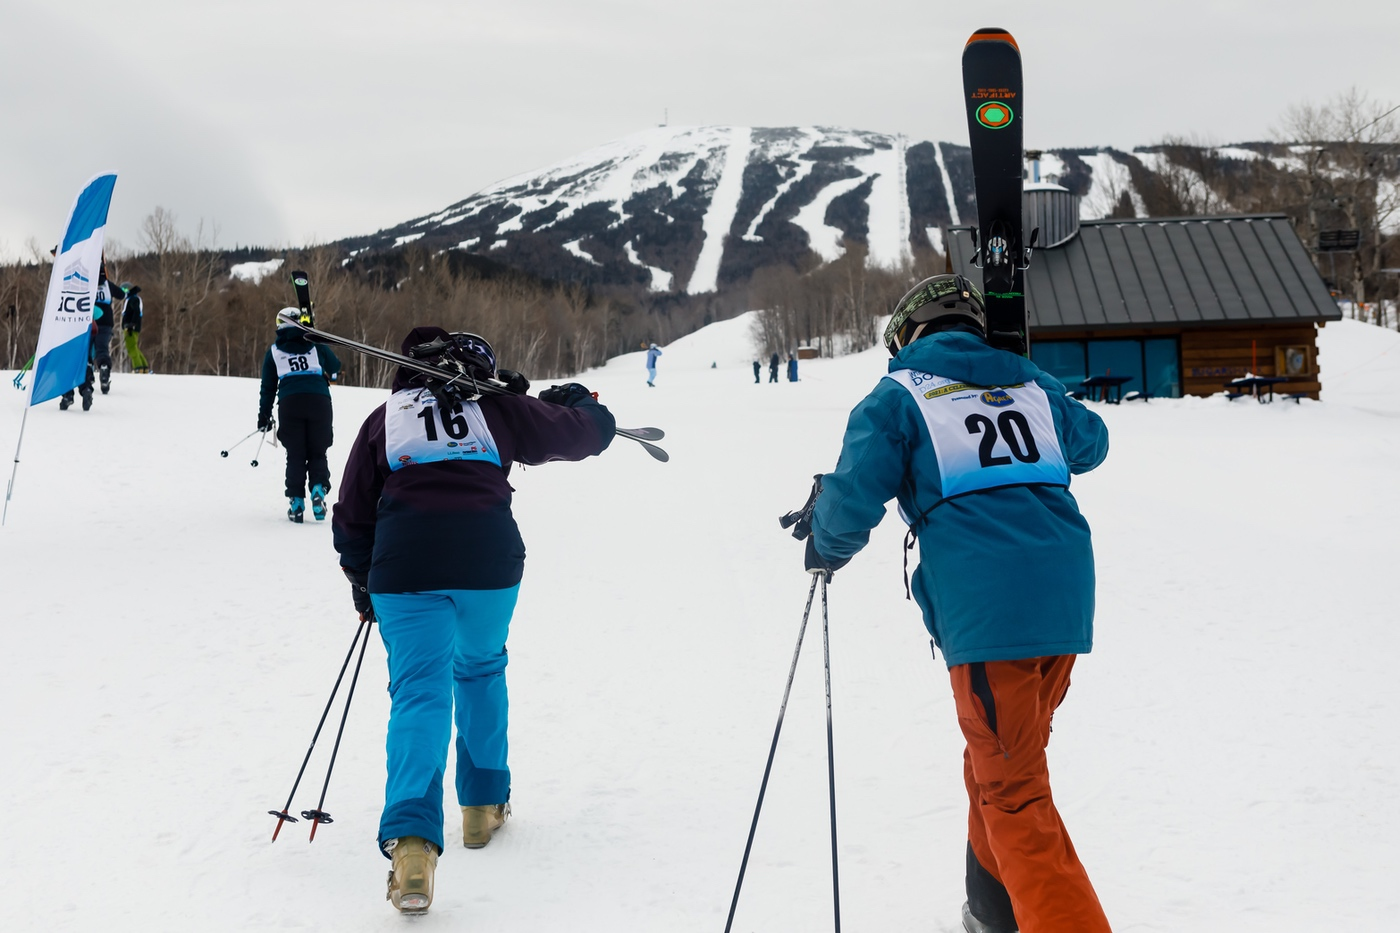 WinterKids Downhill 24 2021 SDP 2871